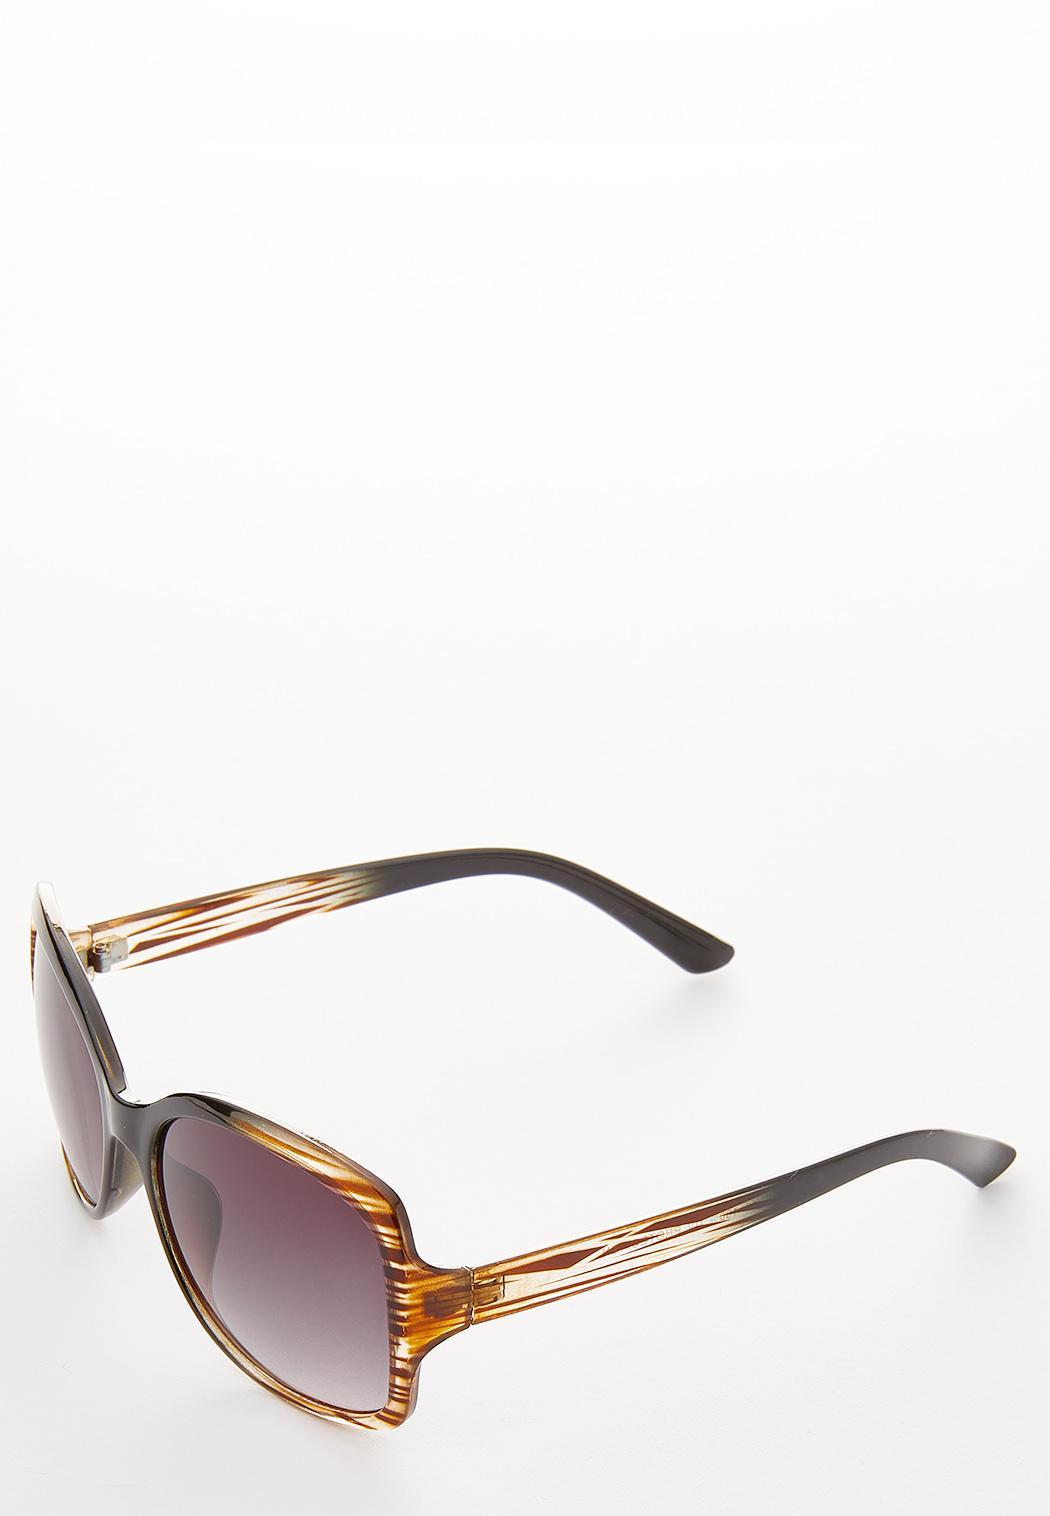 Ombre Square Sunglasses (Item #36088151)